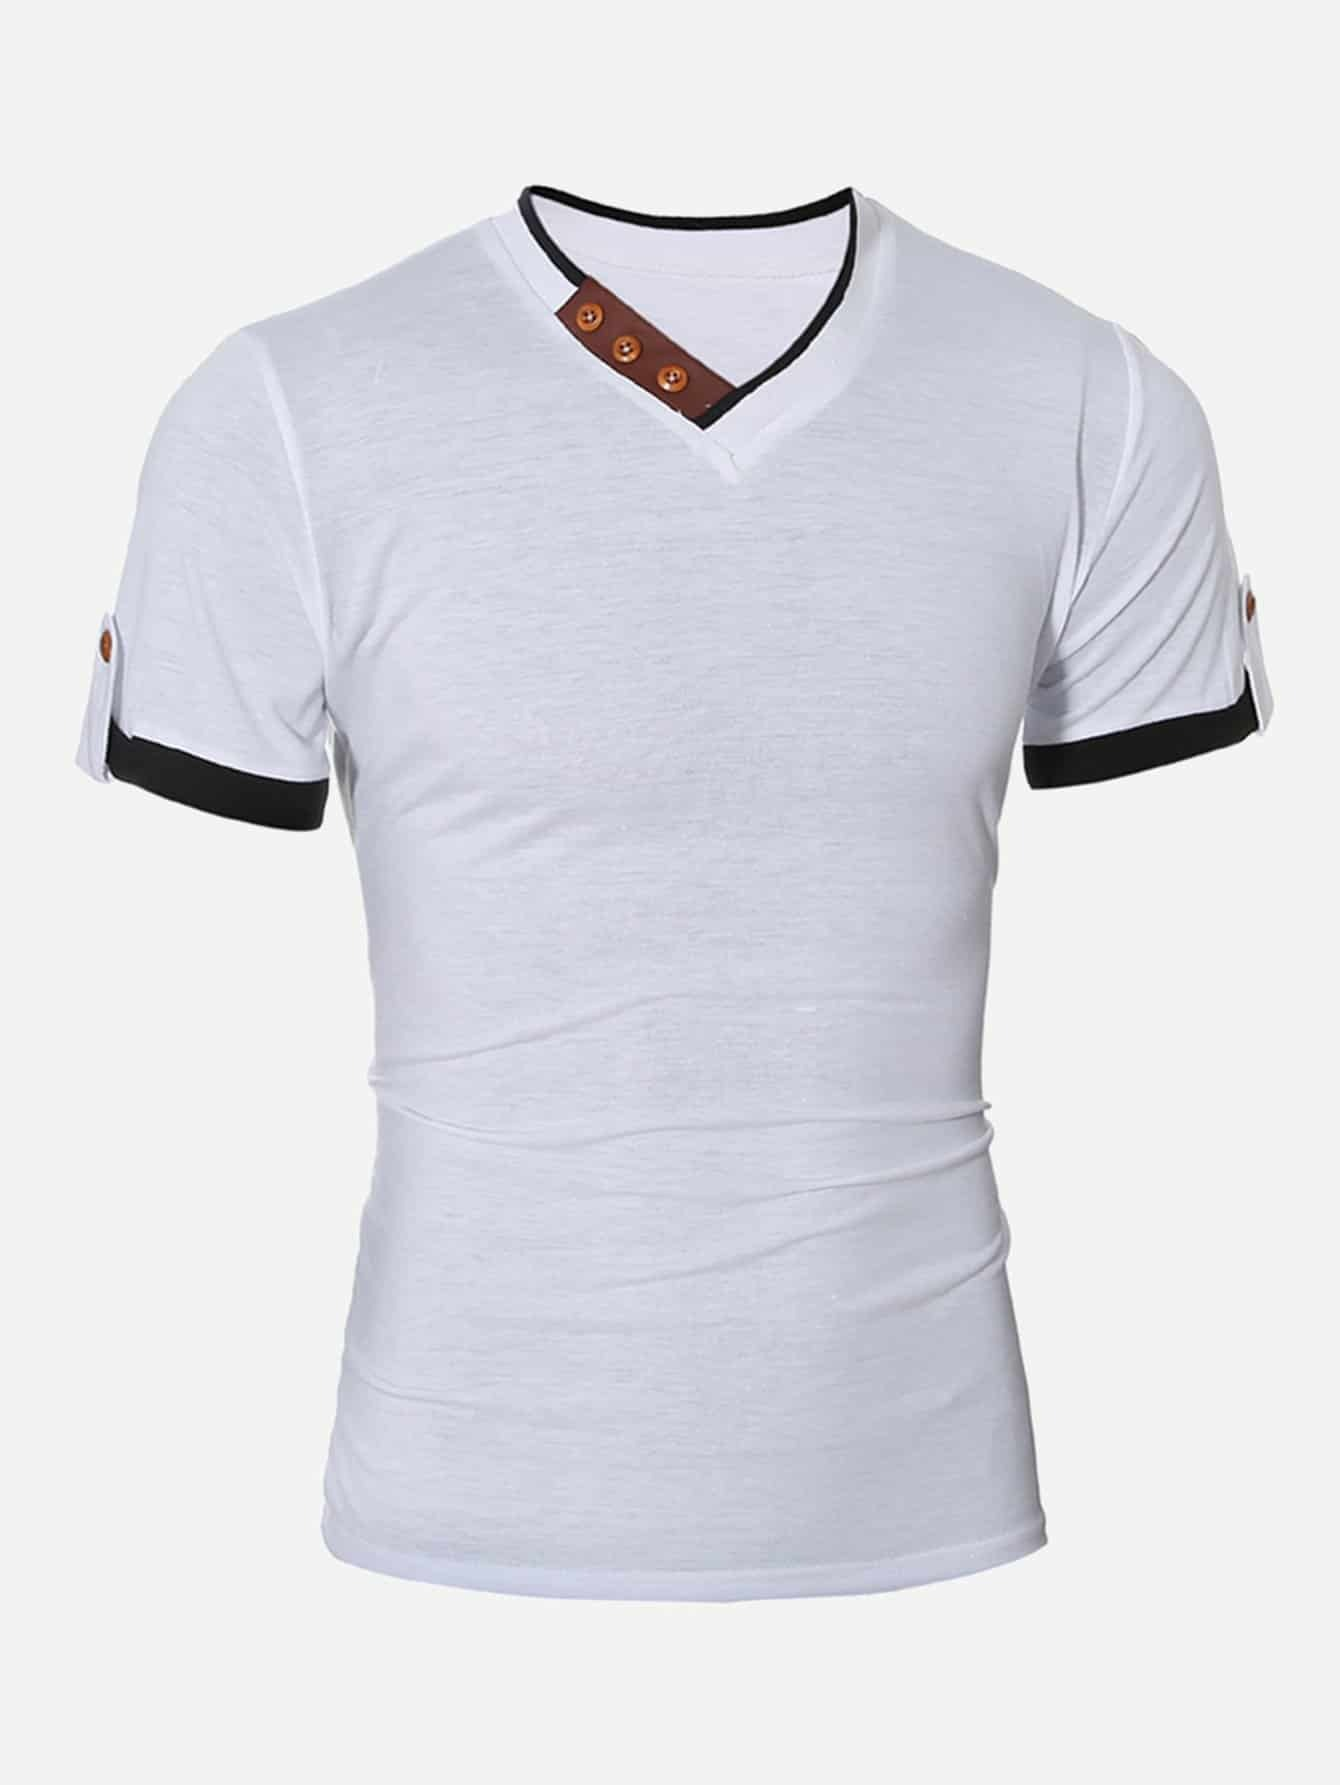 Men Button Detail Roll-up Sleeve Solid T-shirt